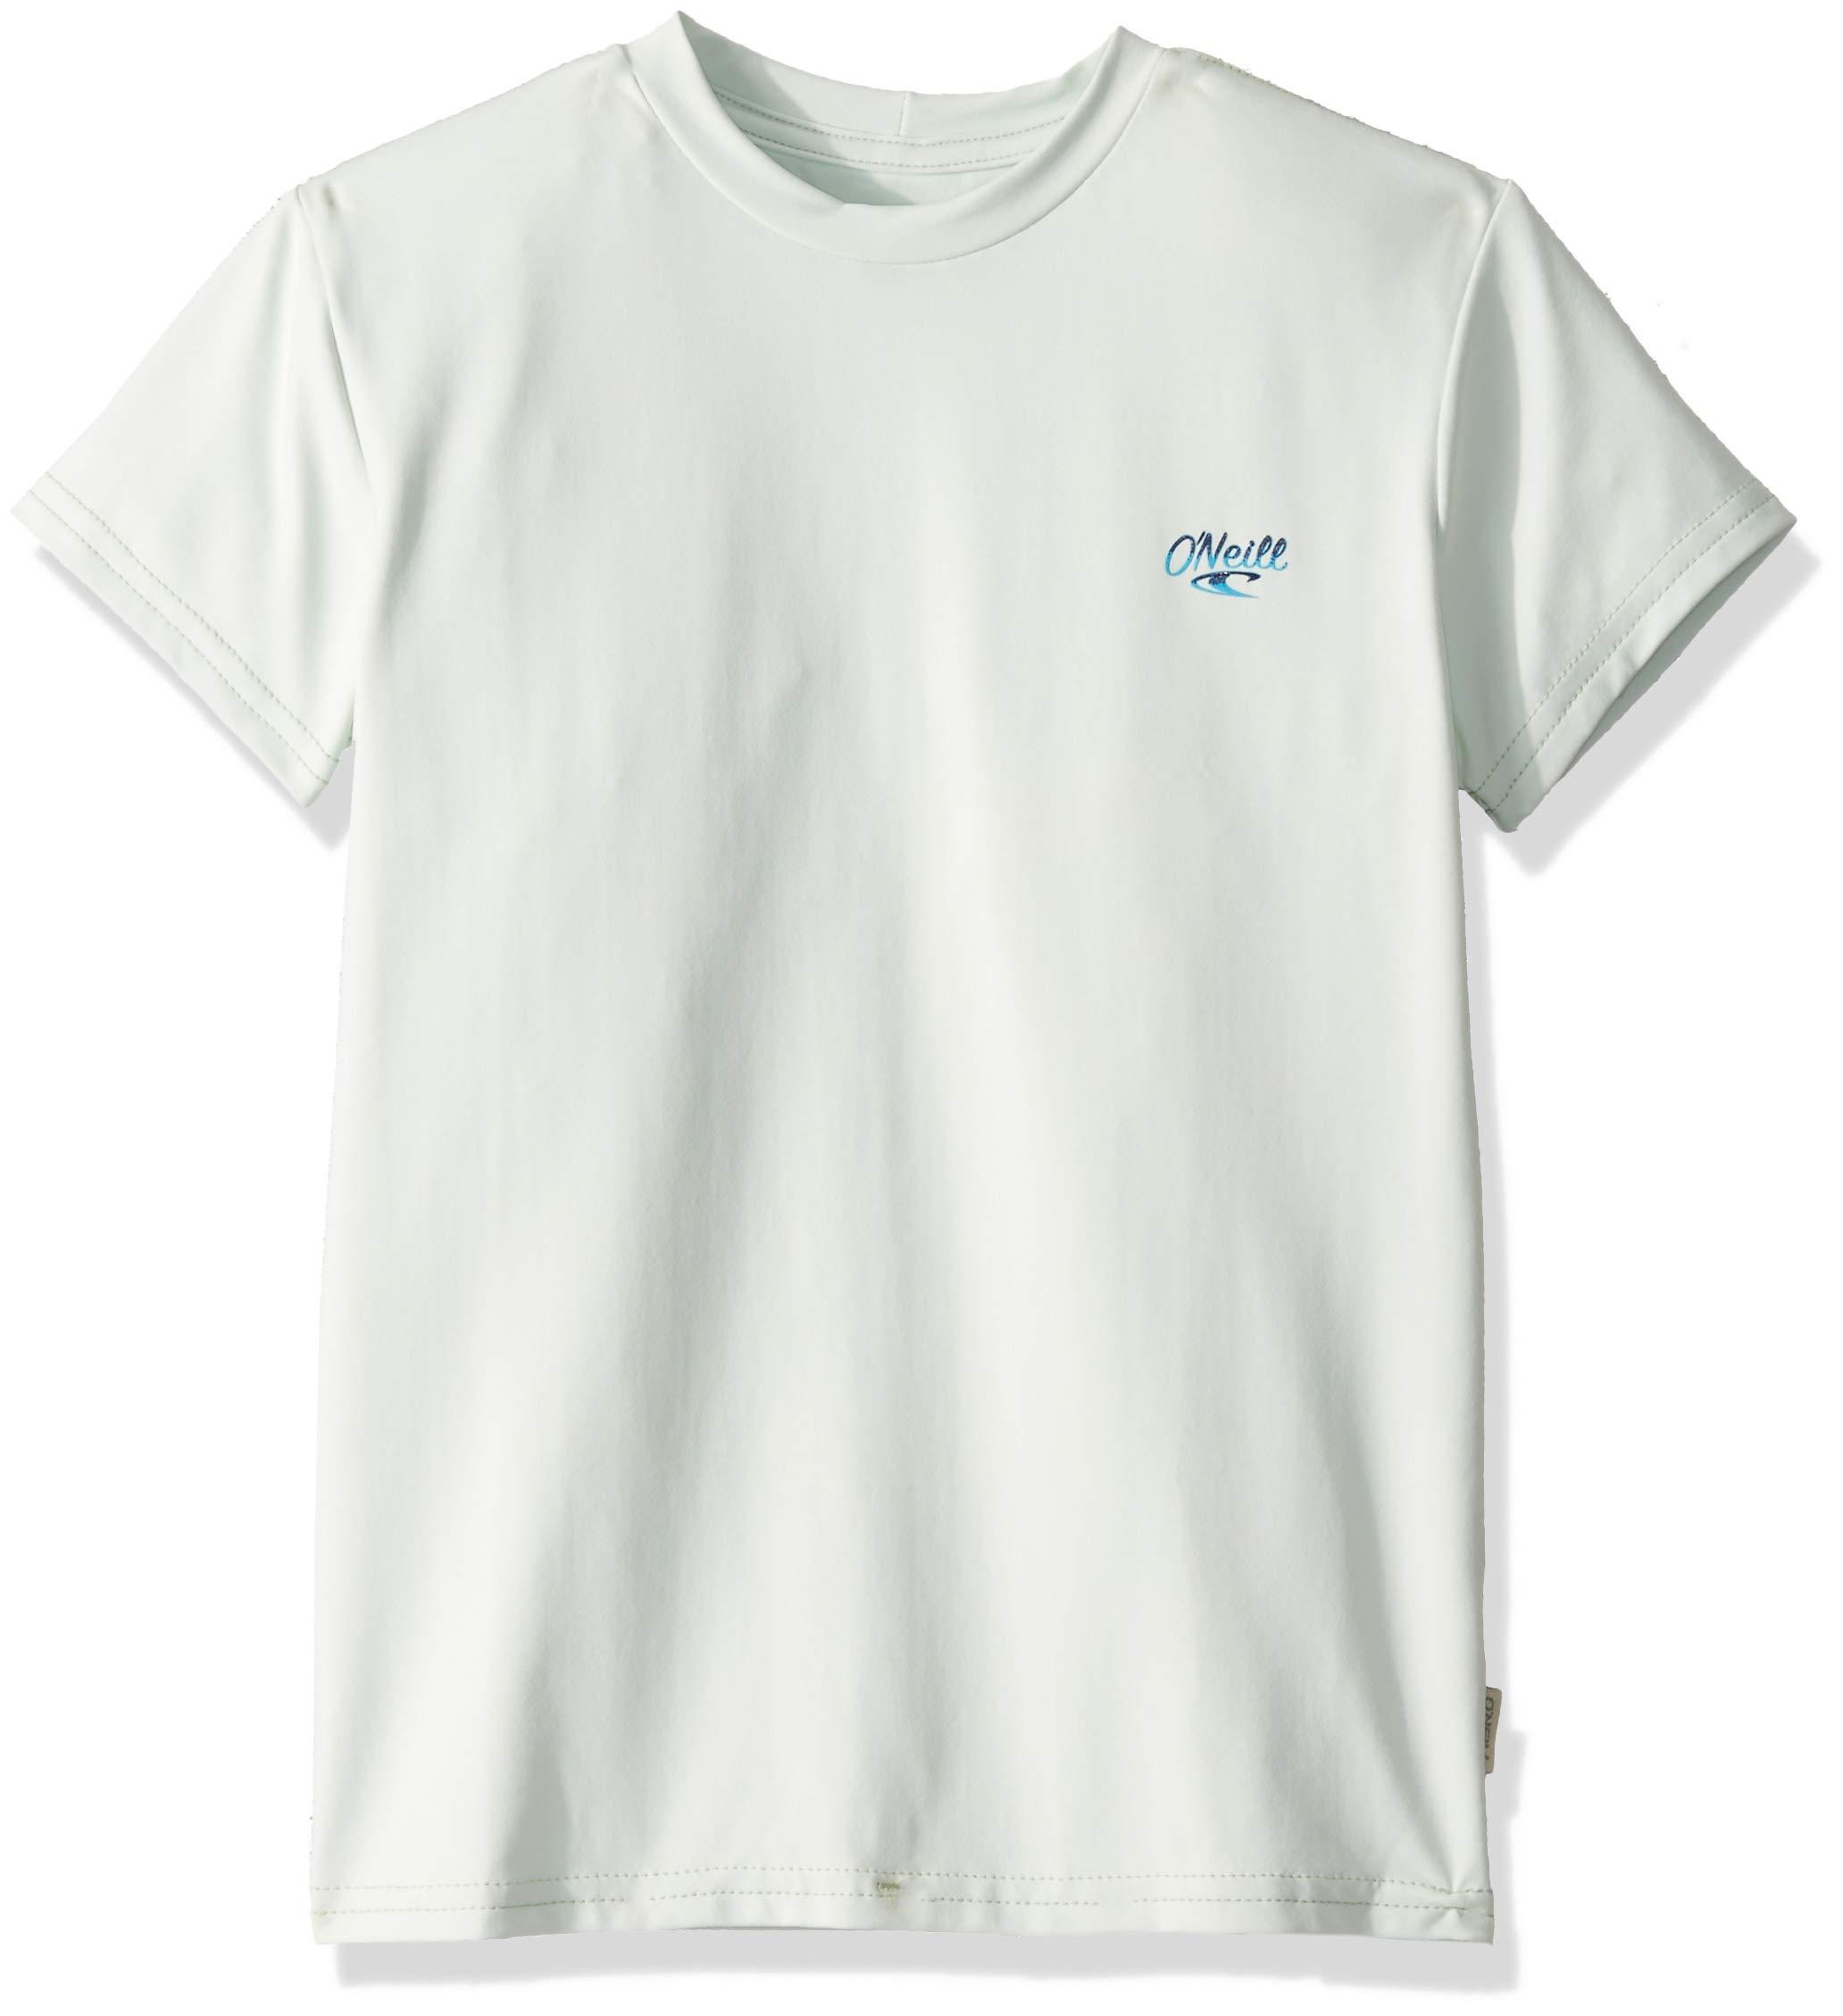 O'Neill Wetsuits Girl's Premium Skins Short Sleeve Sun Shirt, Fresh Mint, Size 8 by O'Neill Wetsuits